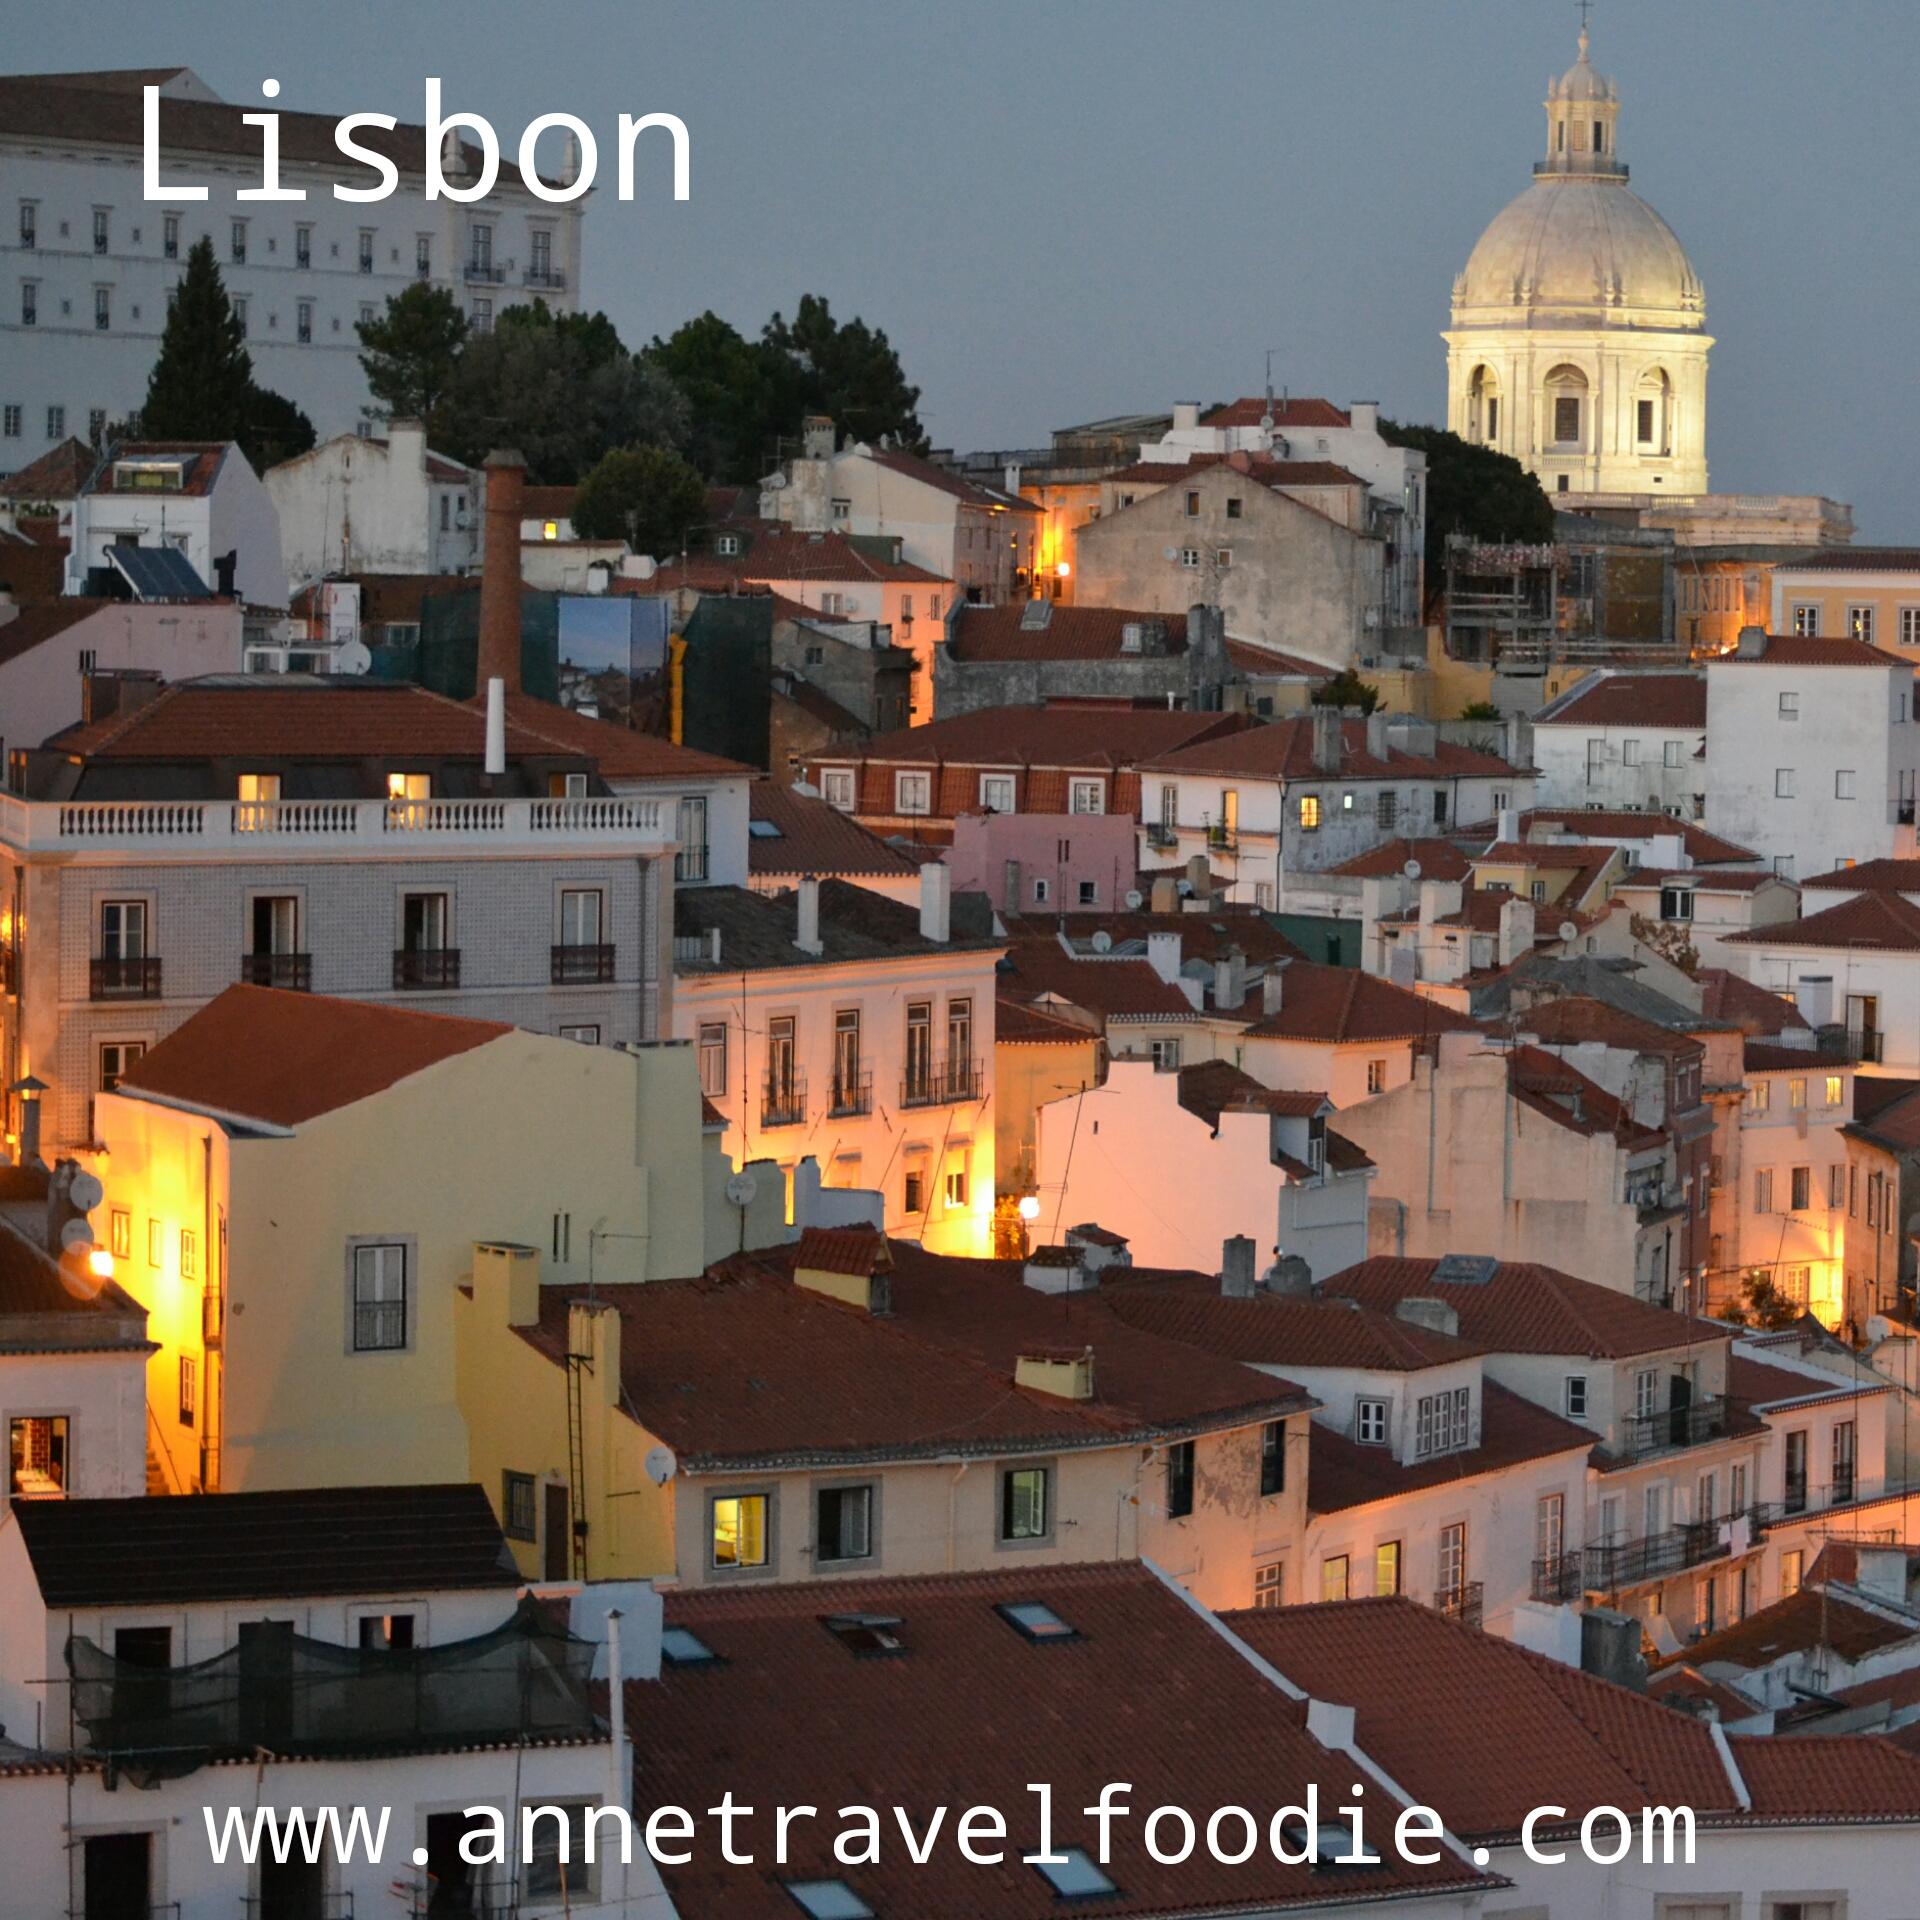 Lisbon Annetravelfoodie